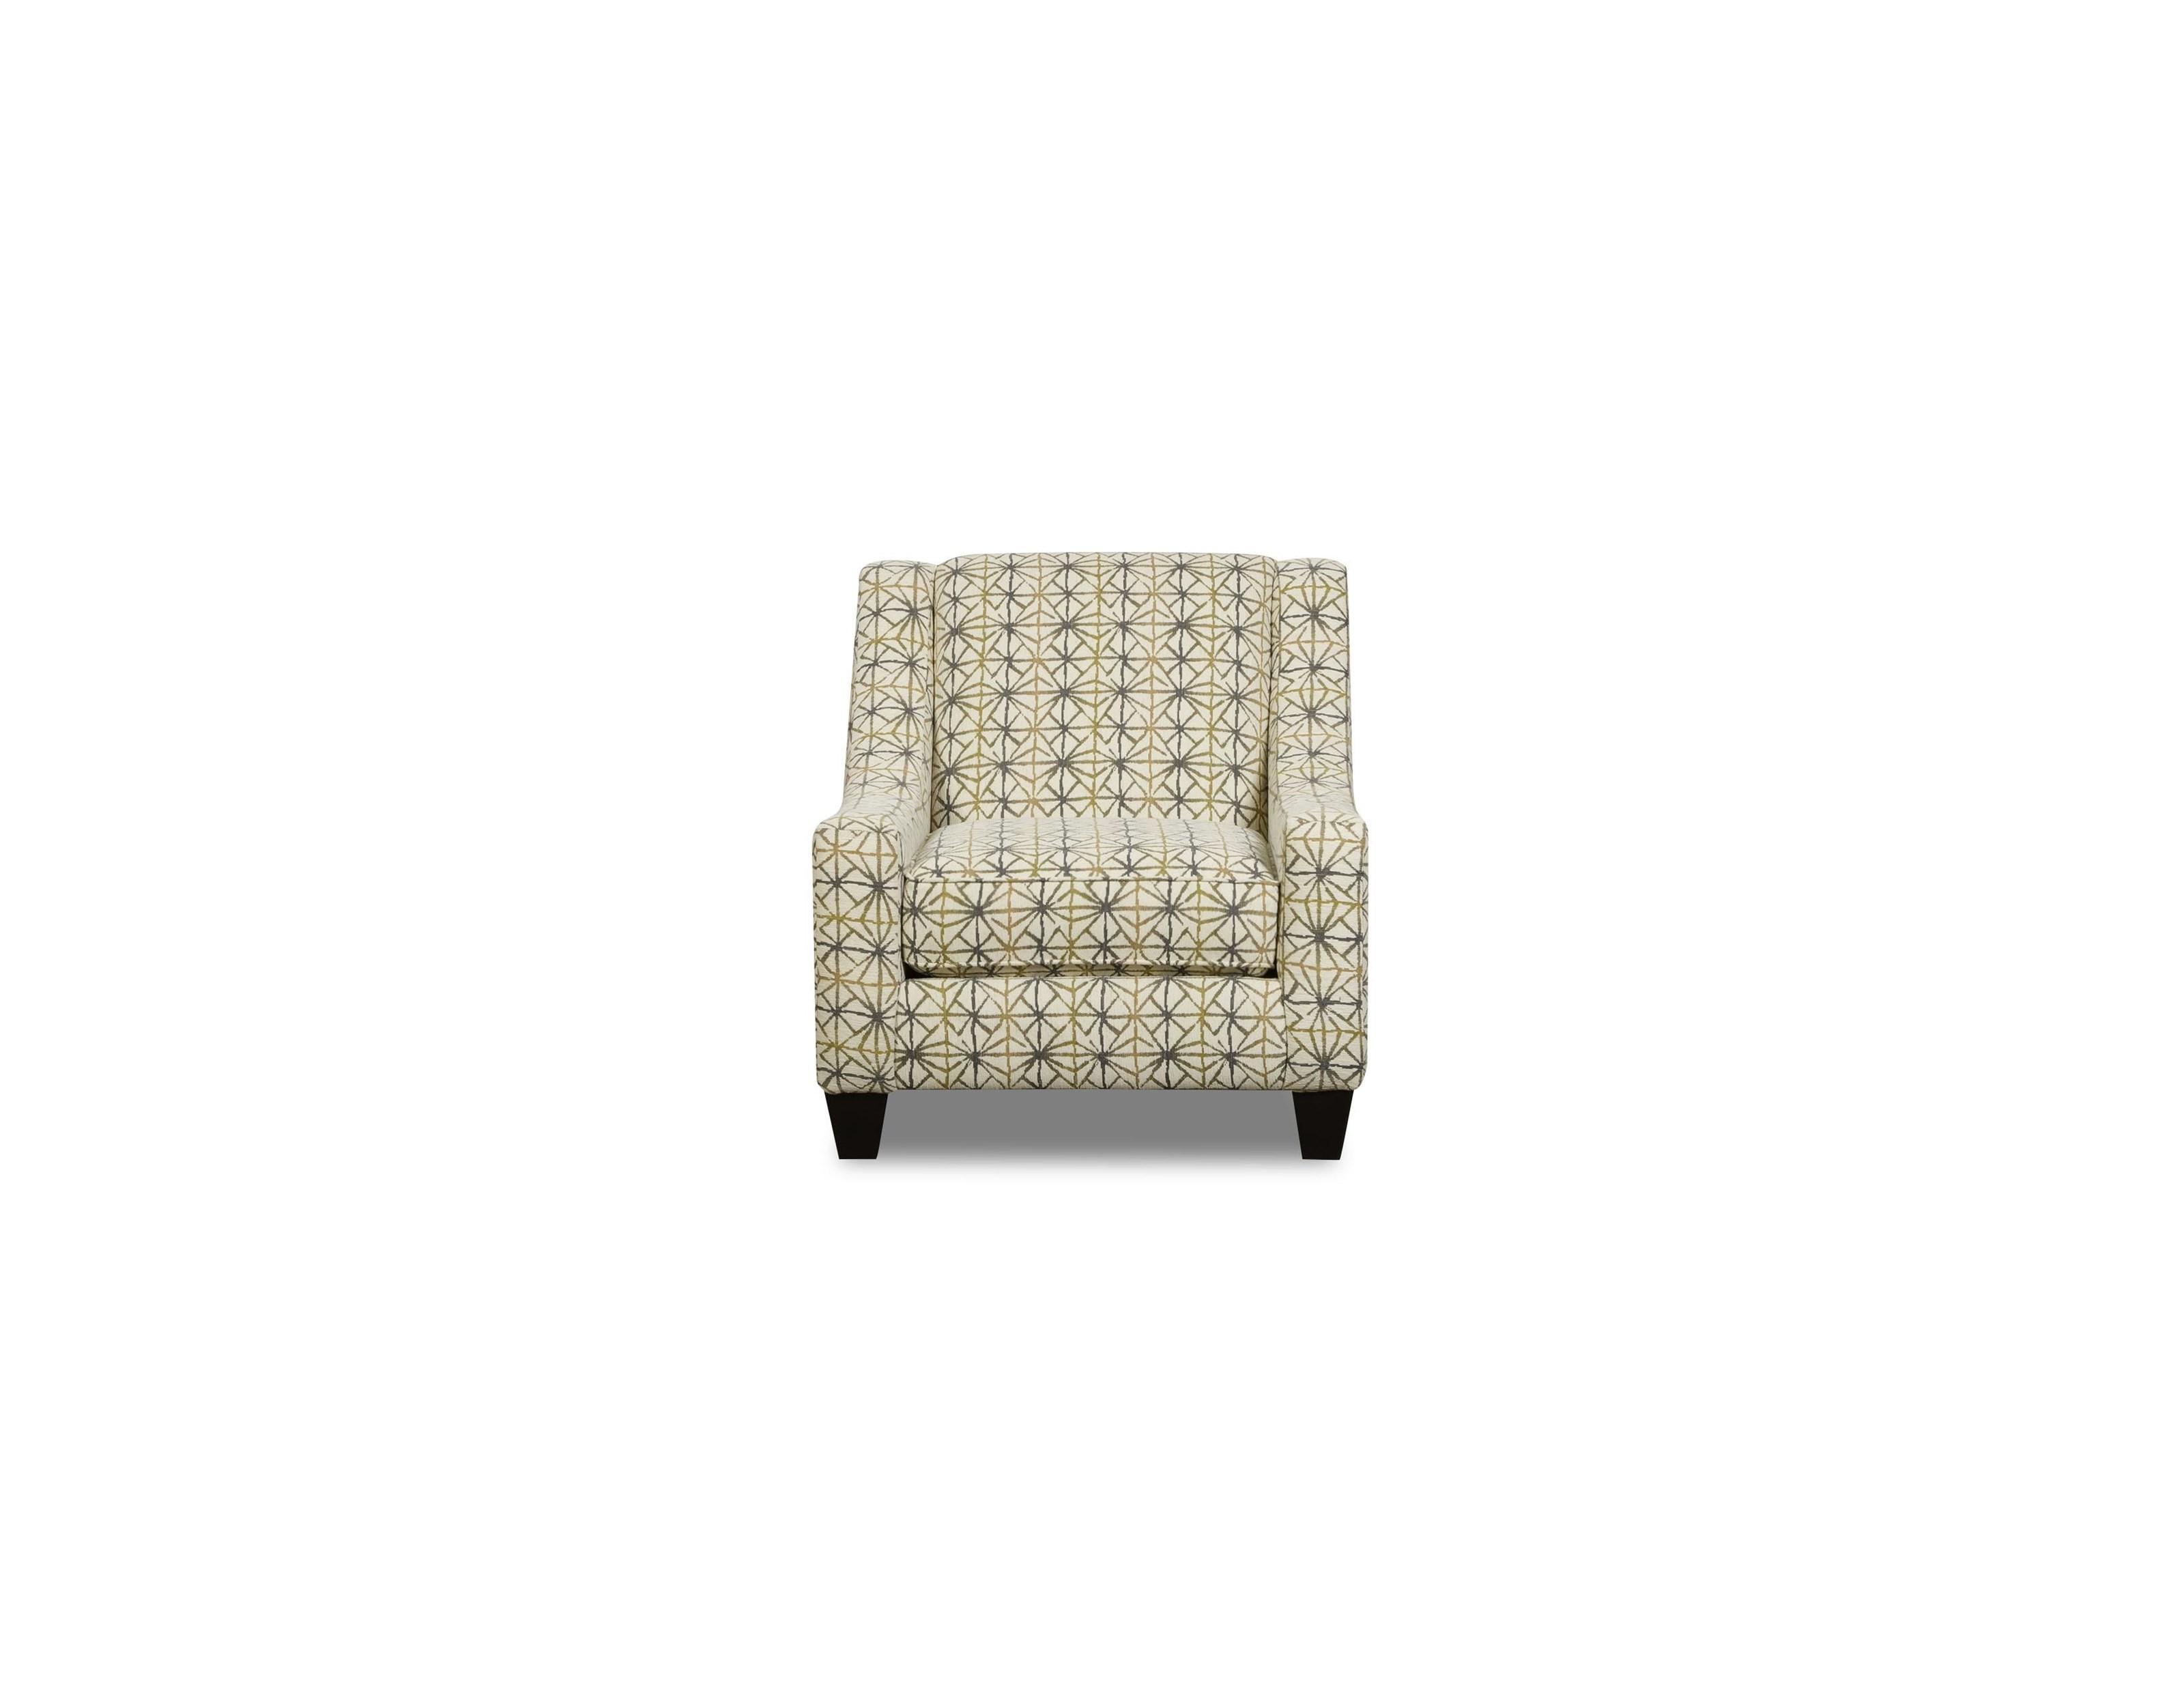 Corinthian Alton Starmatic Accent Chair - Item Number: CORI-AC2029C